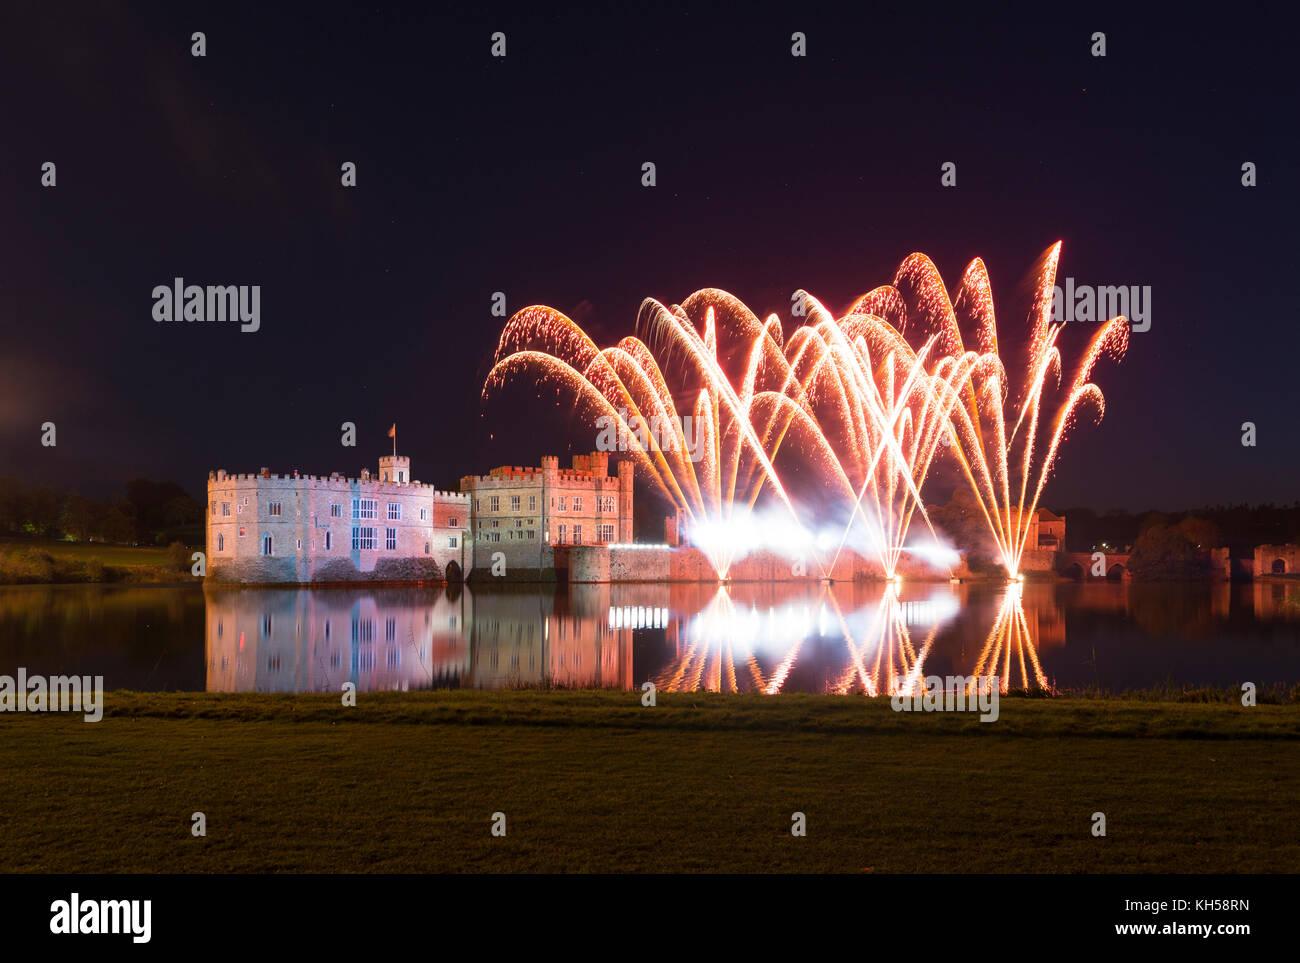 Firework display and light show at Leeds Castle, Kent - Stock Image